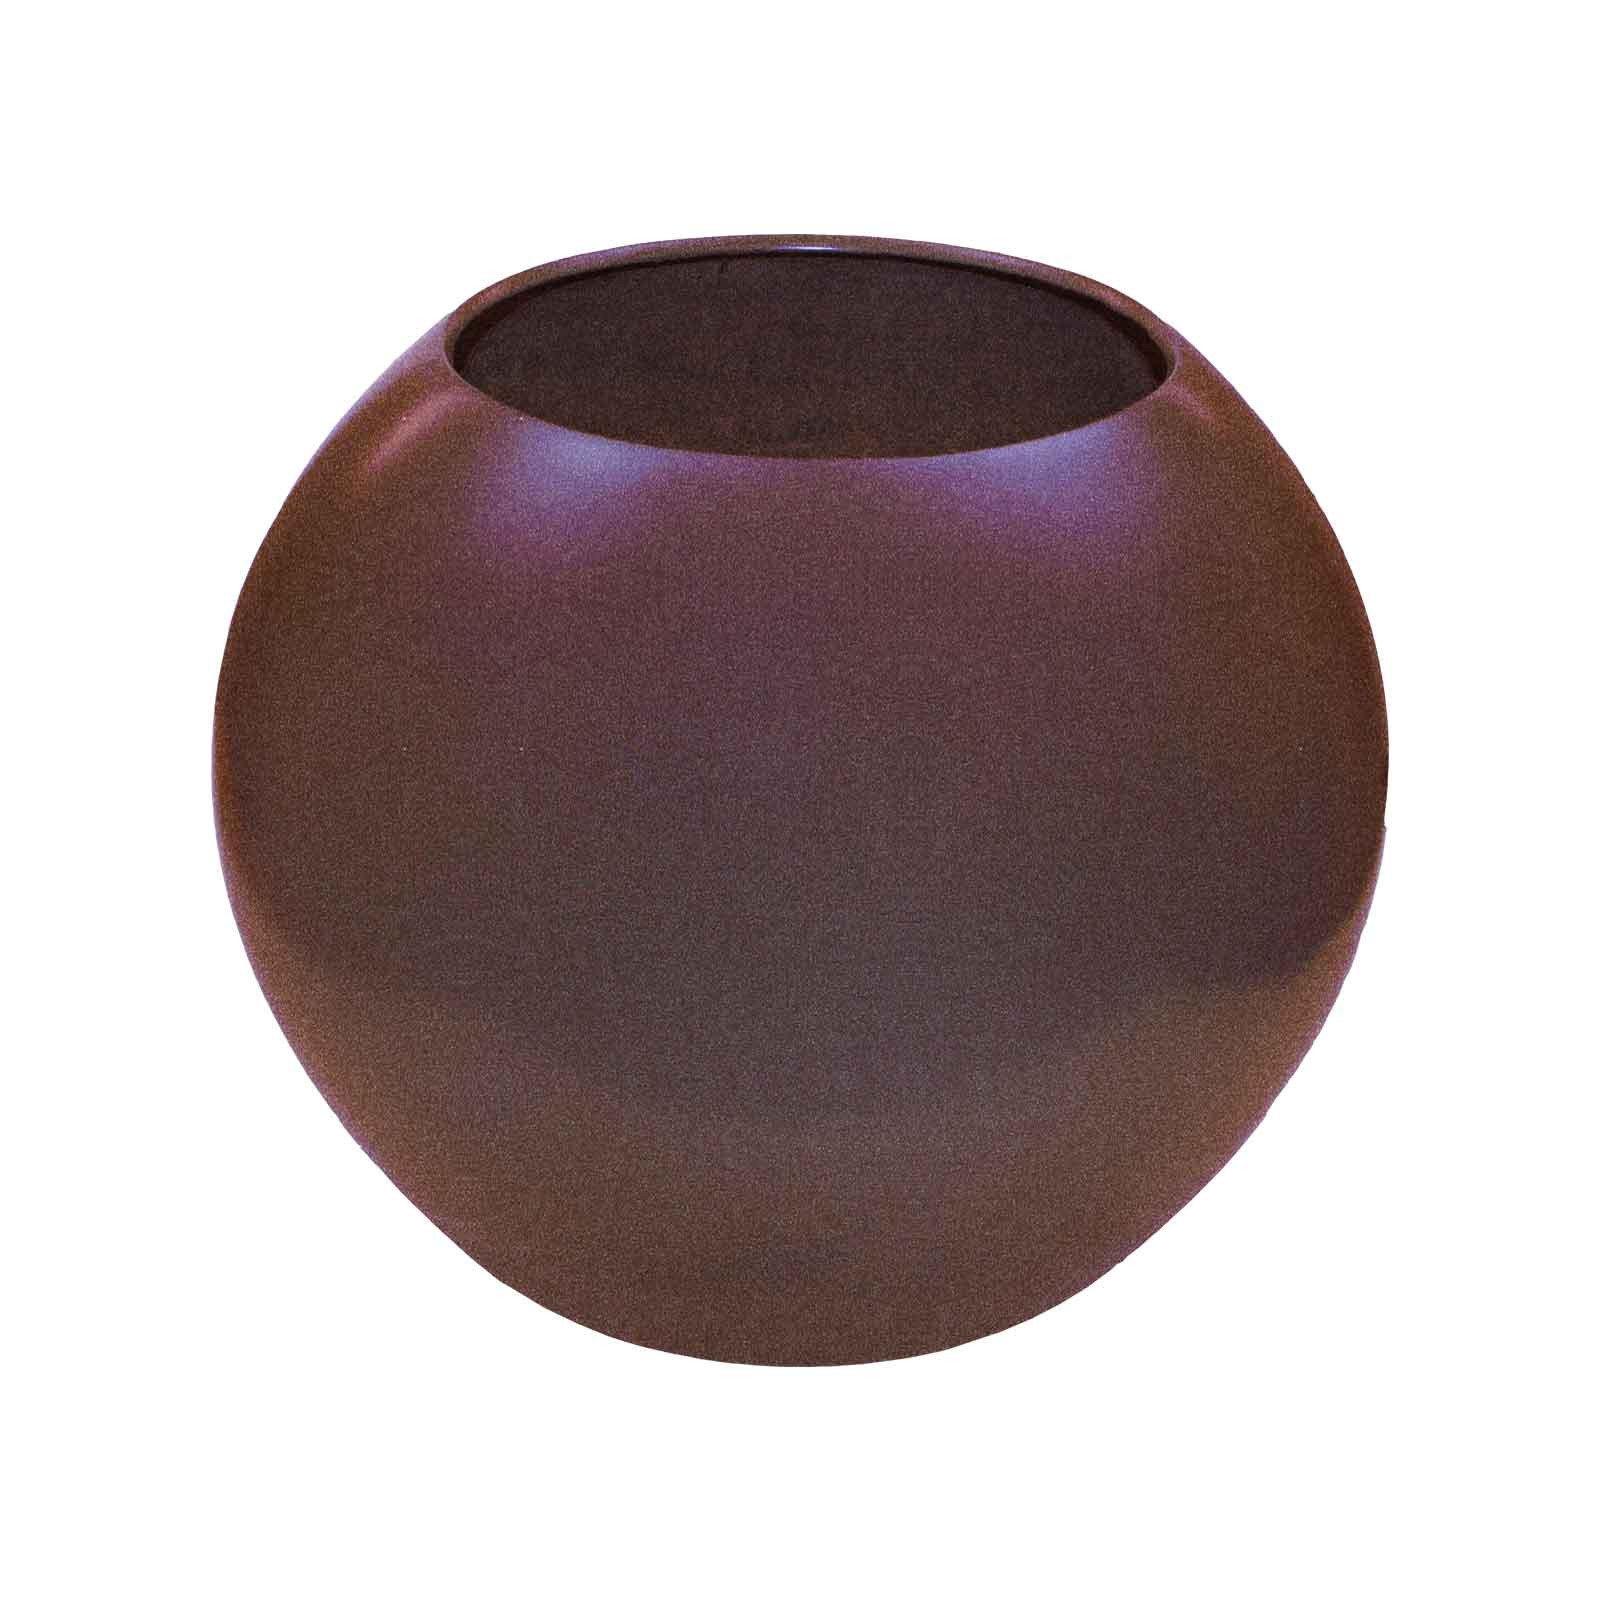 Sphere Planter - Fiberglass - 24'/36' Diameter